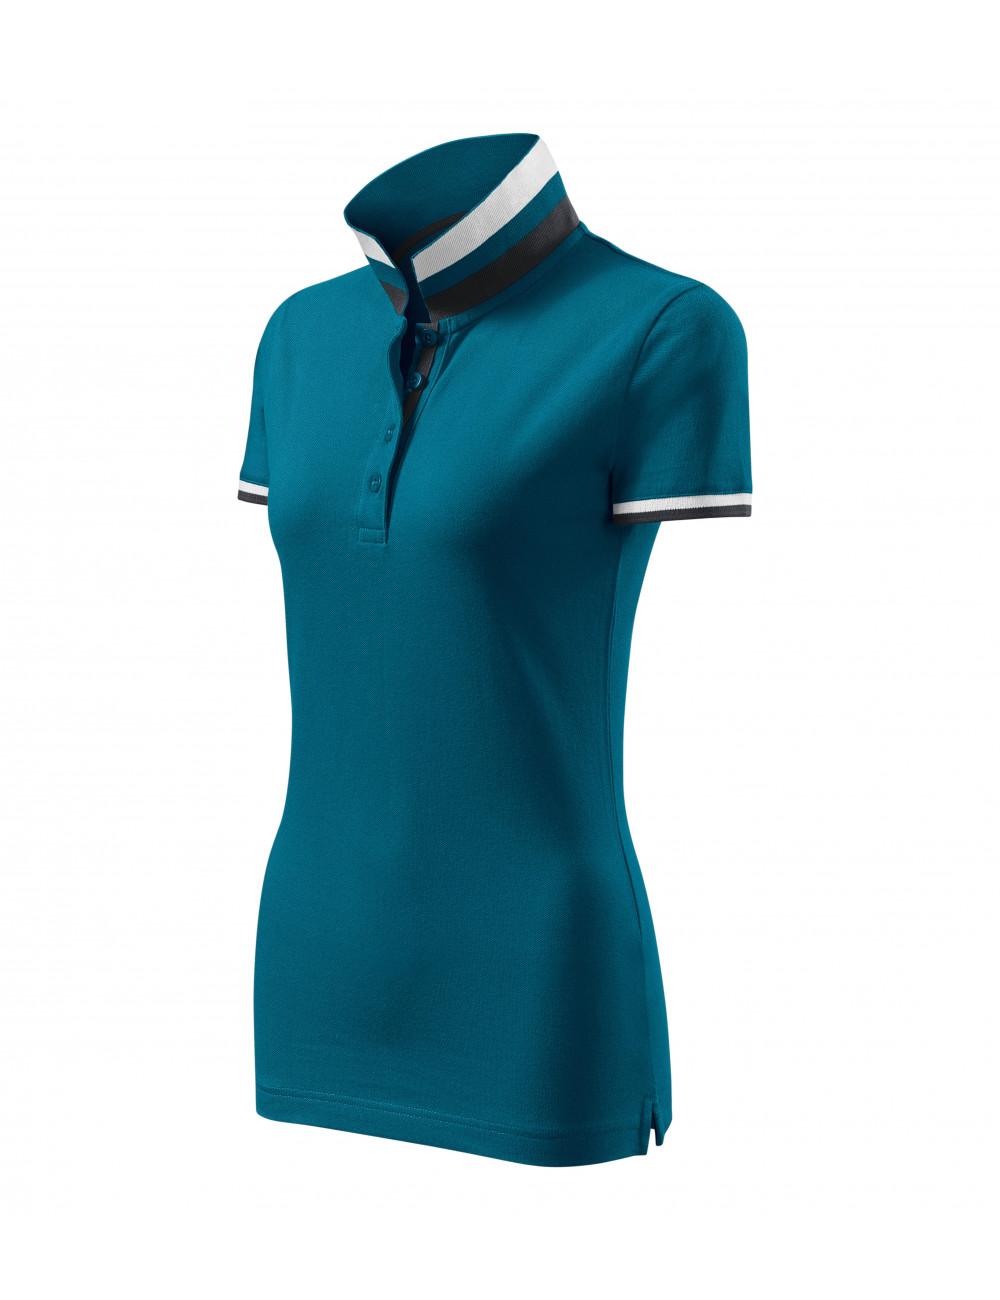 Adler MALFINIPREMIUM Koszulka polo damska Collar Up 257 petrol blue